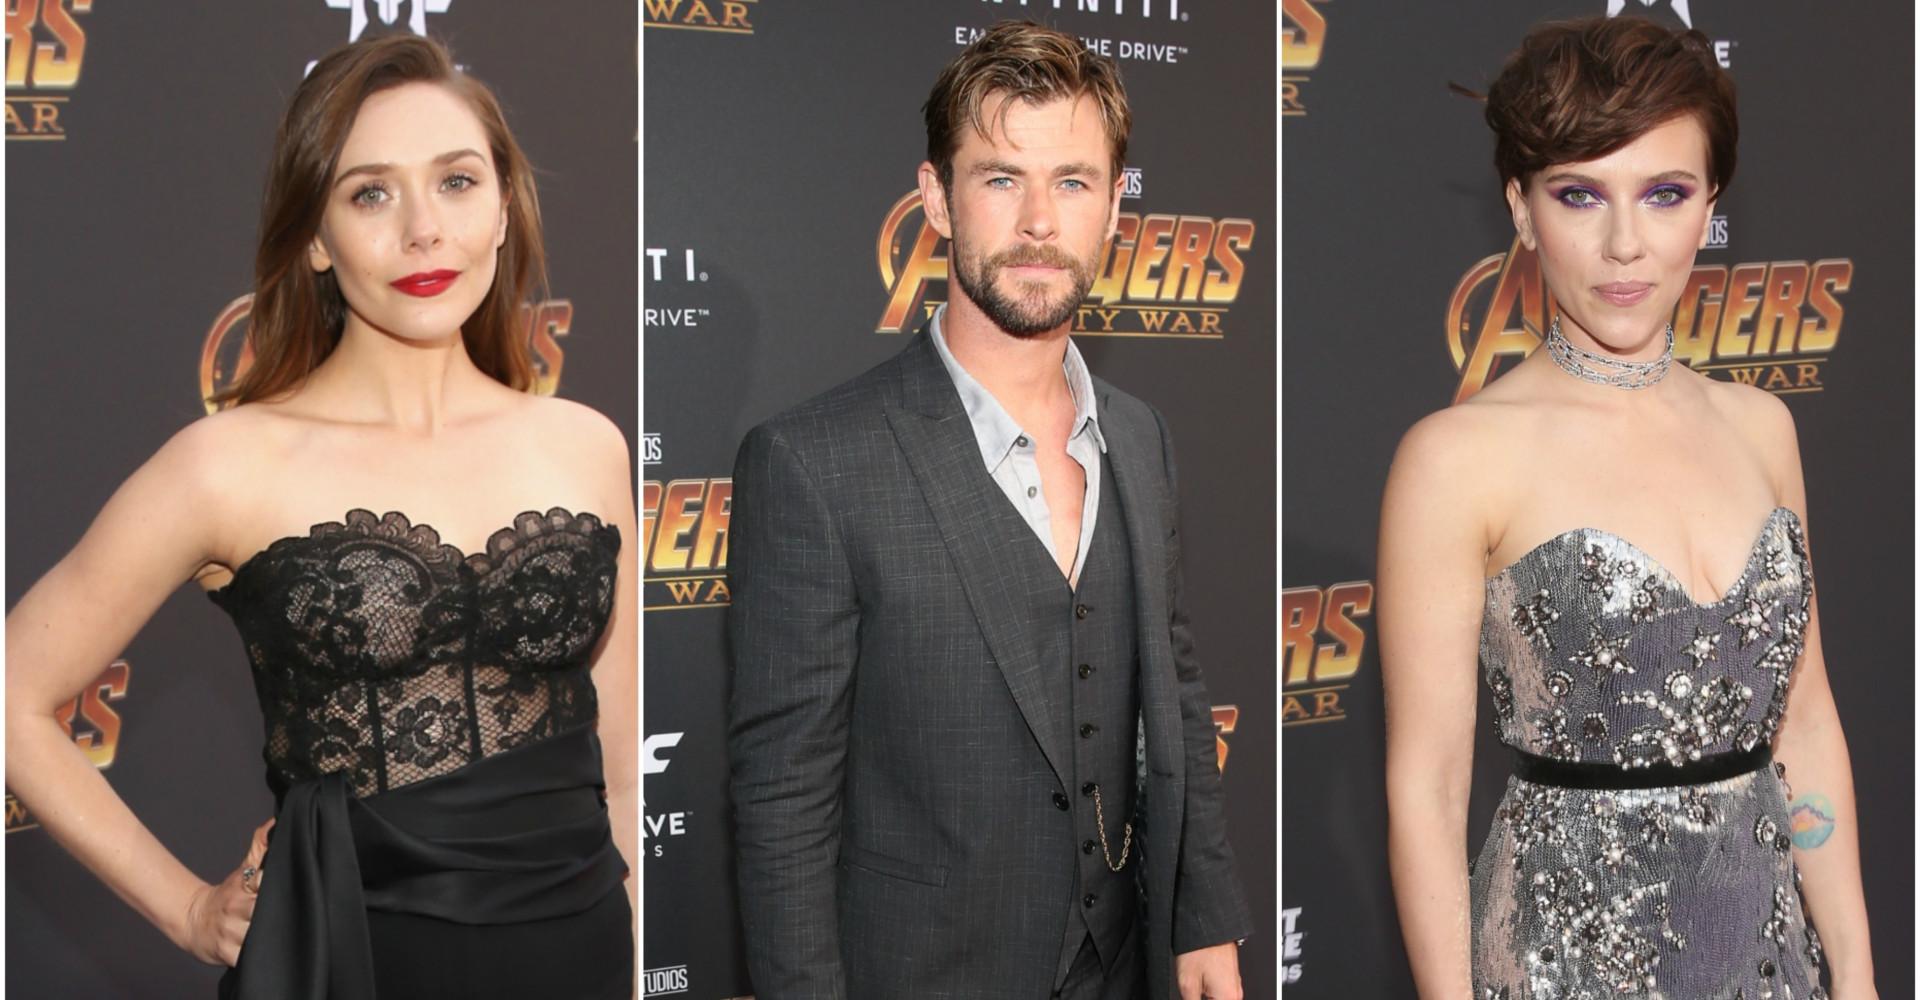 El glamuroso estreno de 'Avengers: Infinity War'